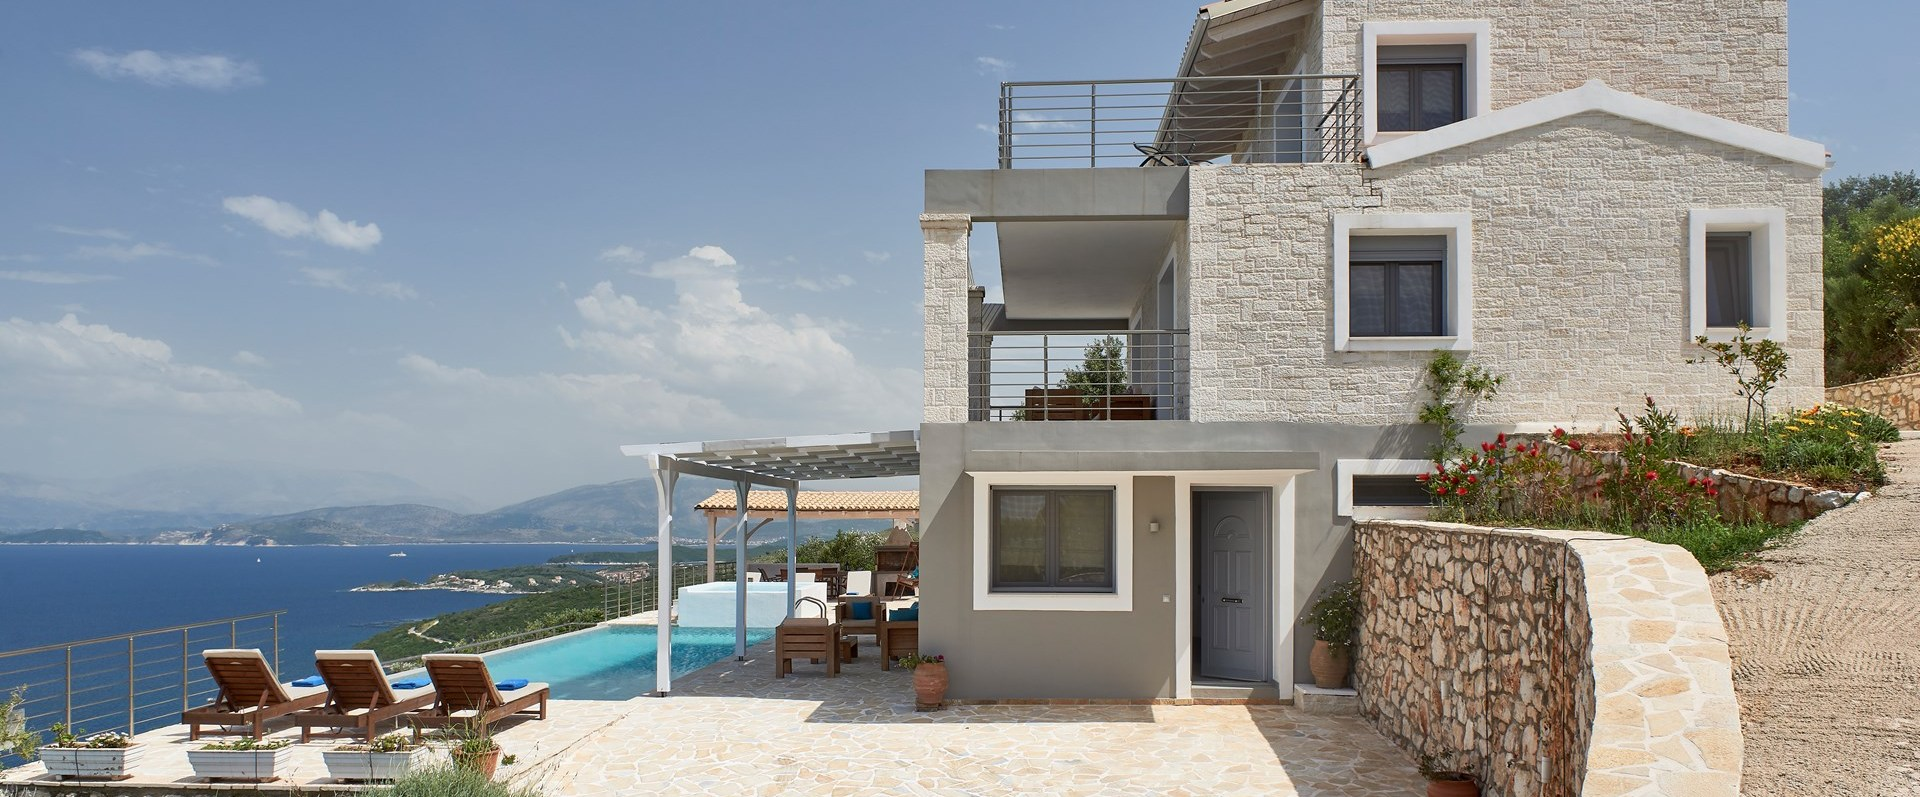 luxury-family-villa-holidays-corfu